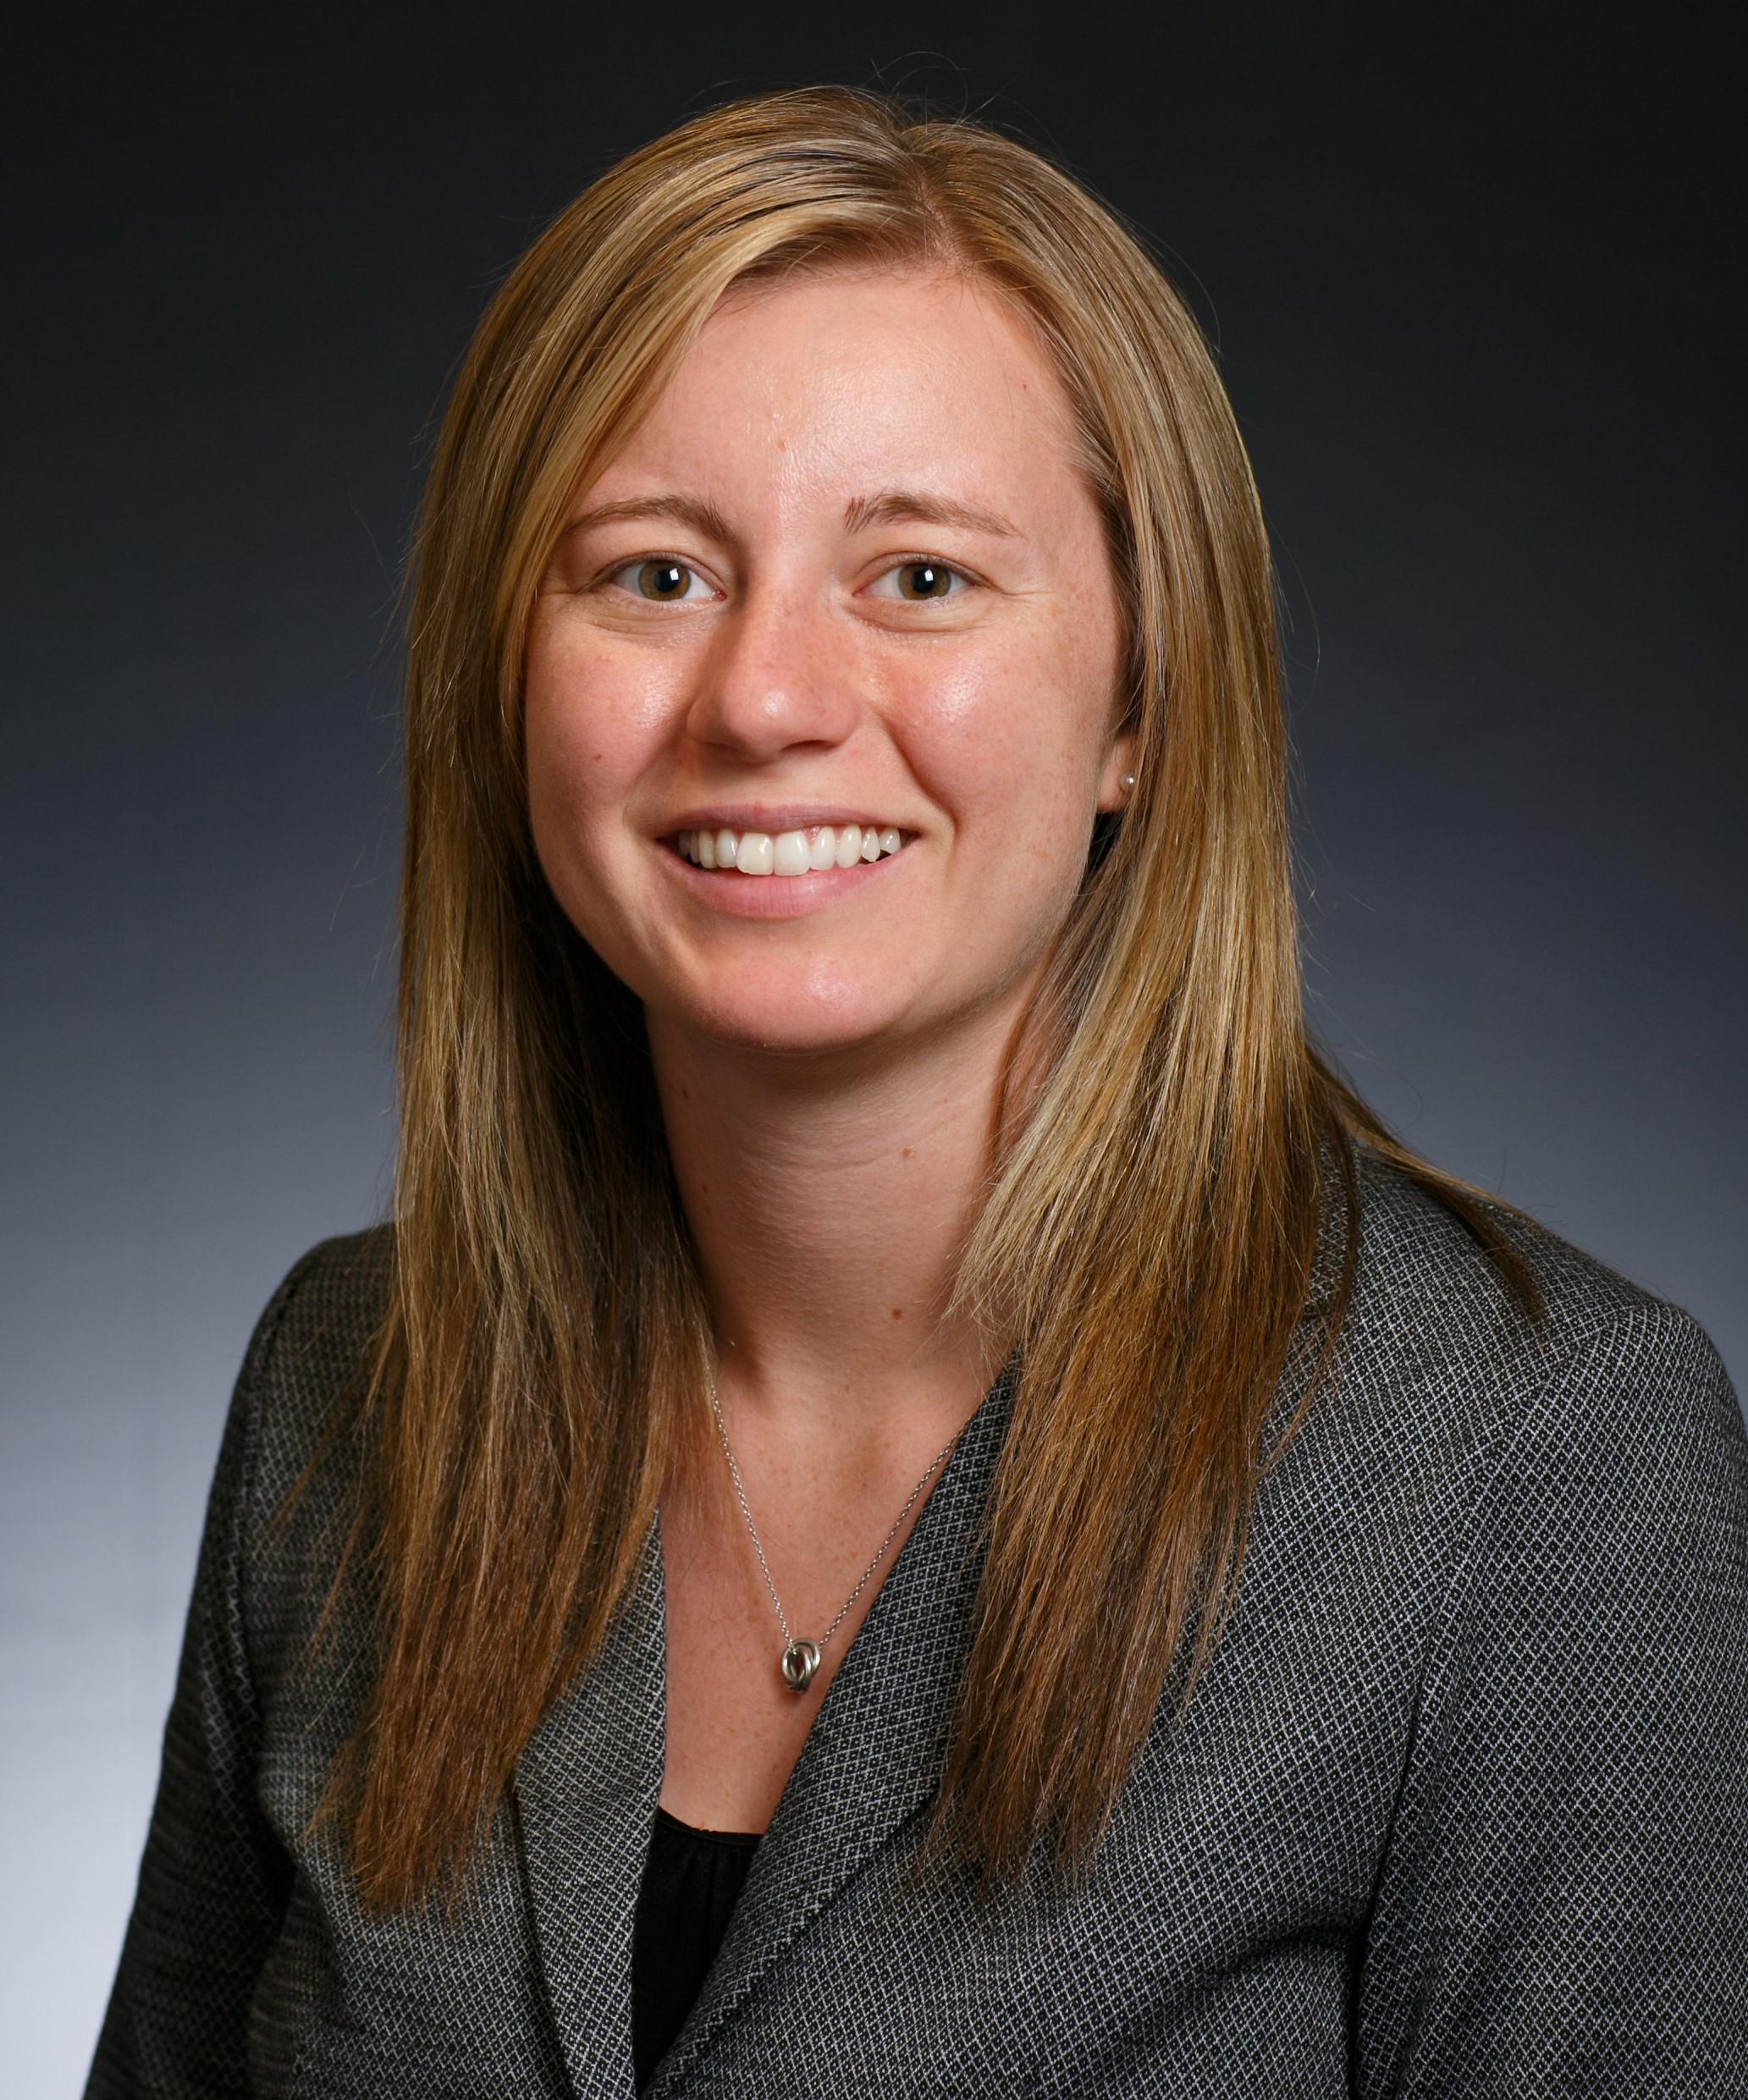 Leah Leaman Earns Certified Public Accountant (CPA) Designation